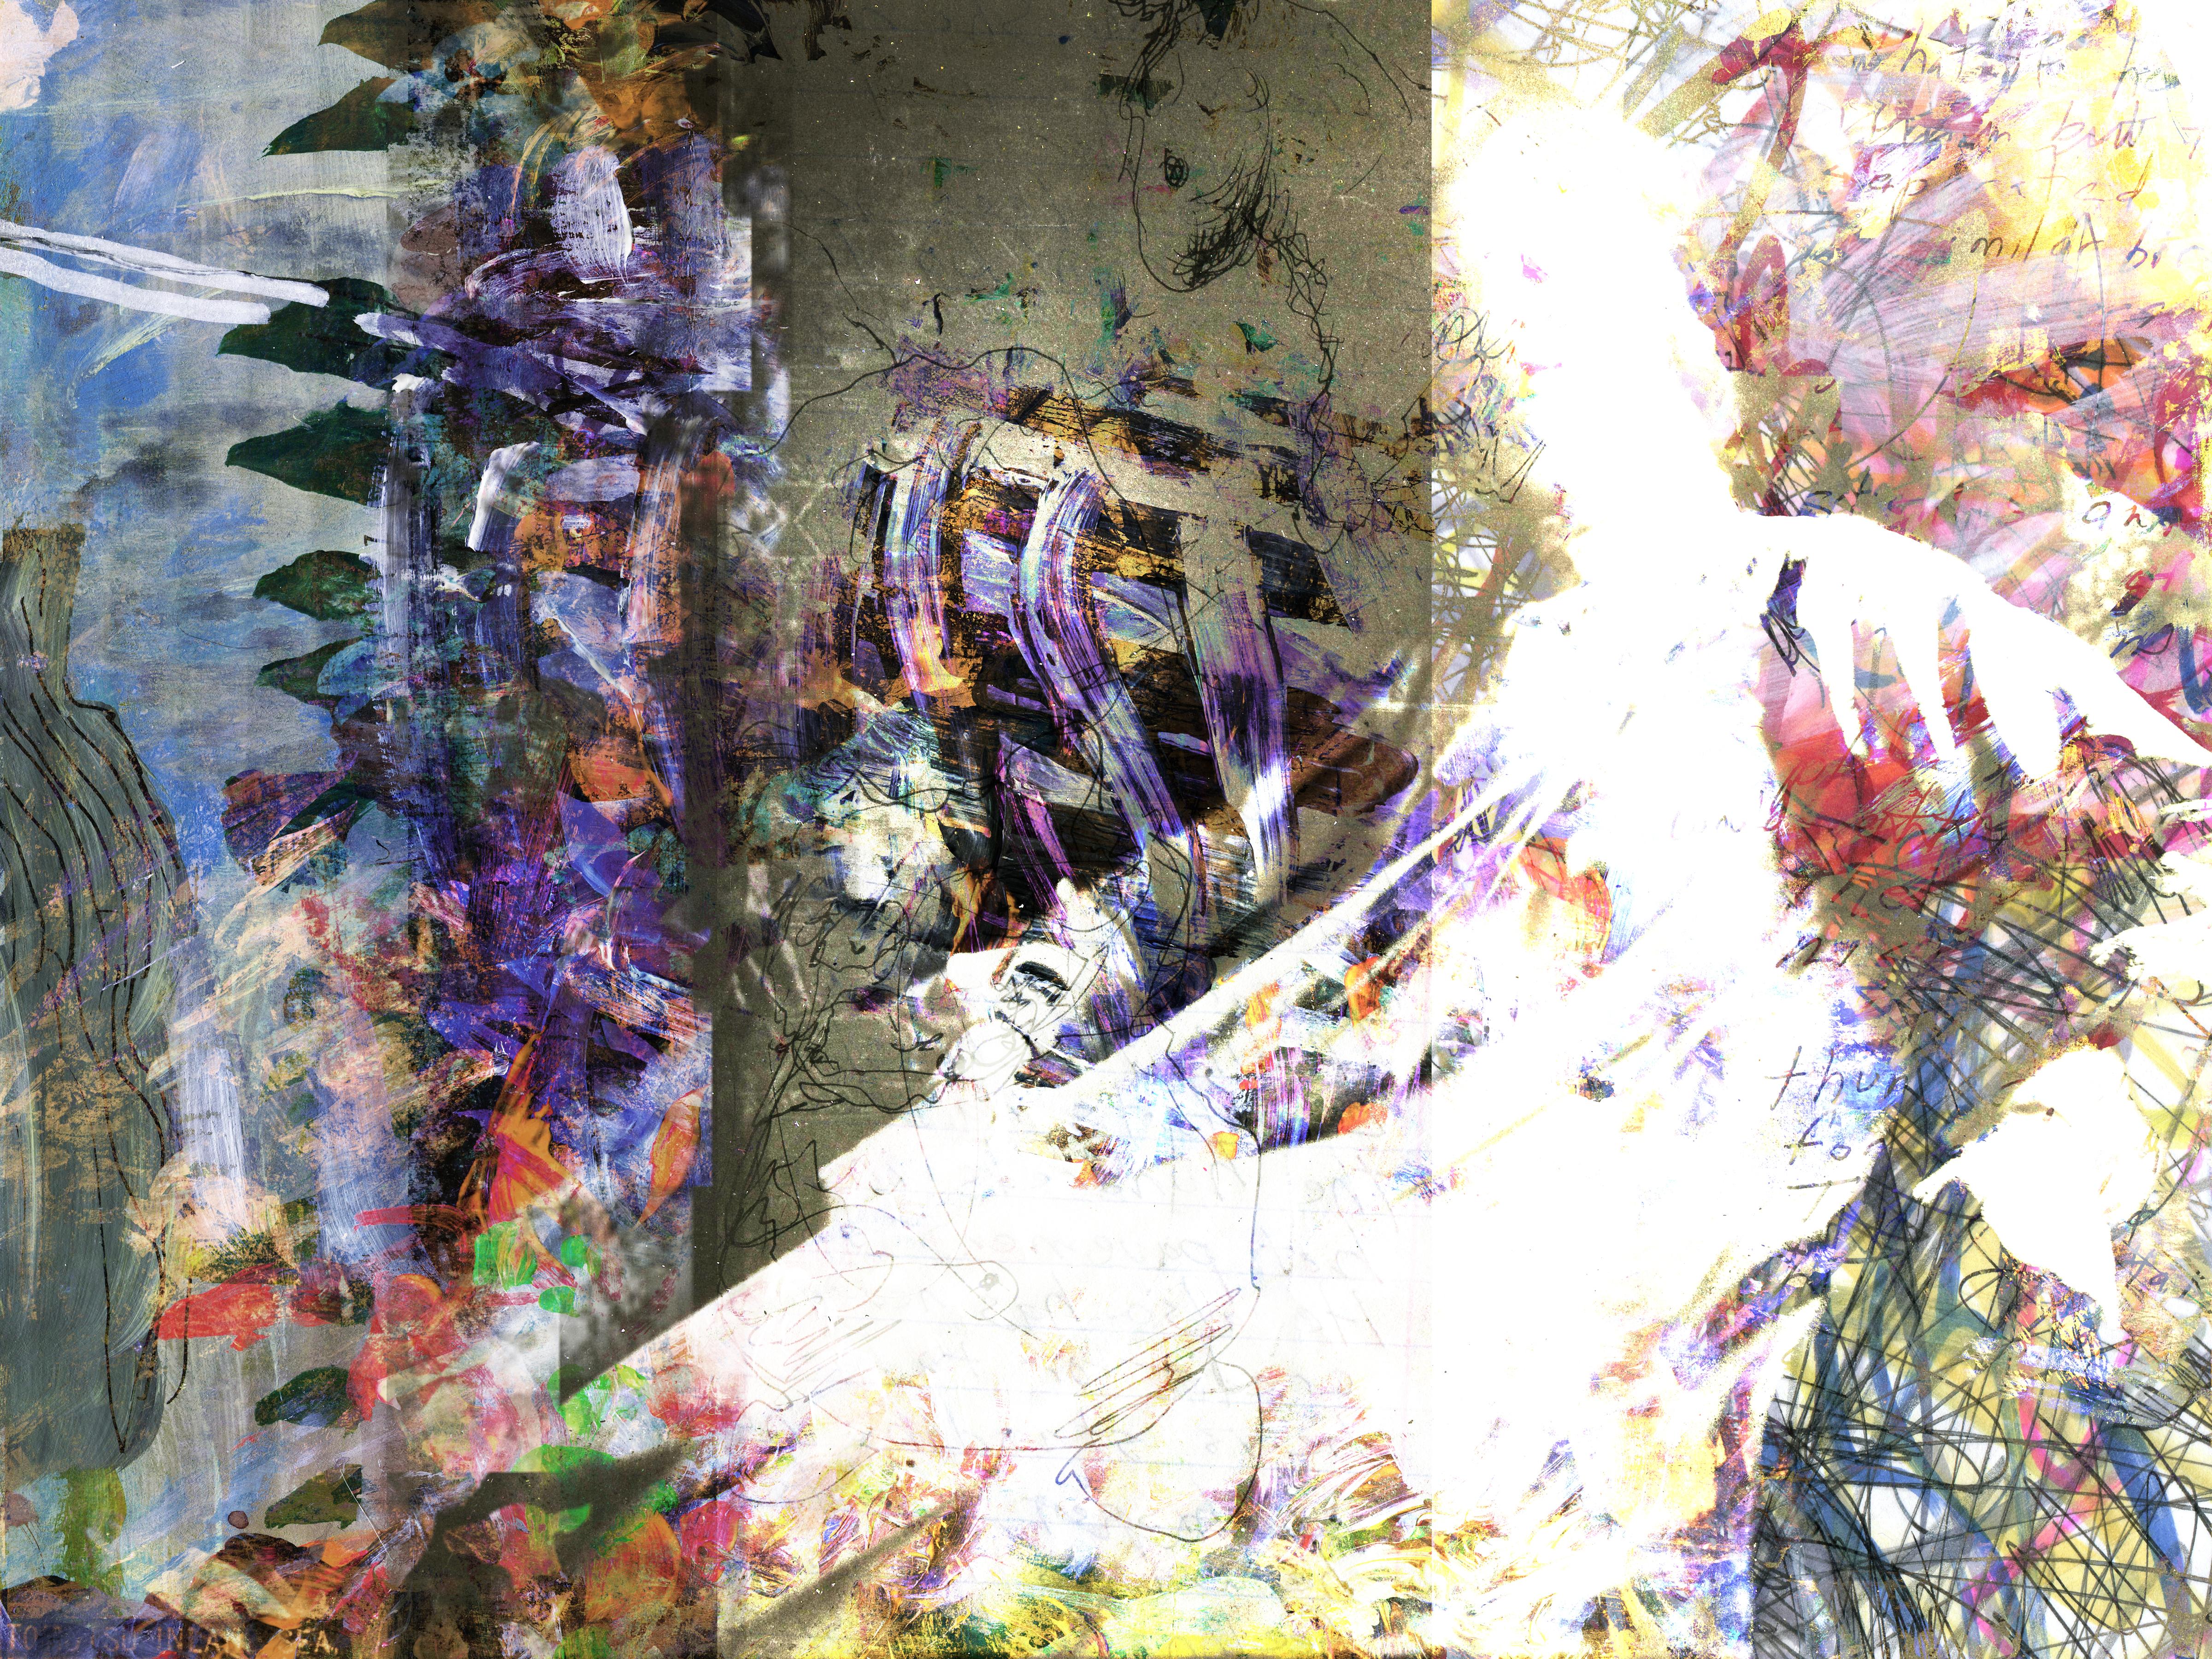 Receding Lividness (5/19)